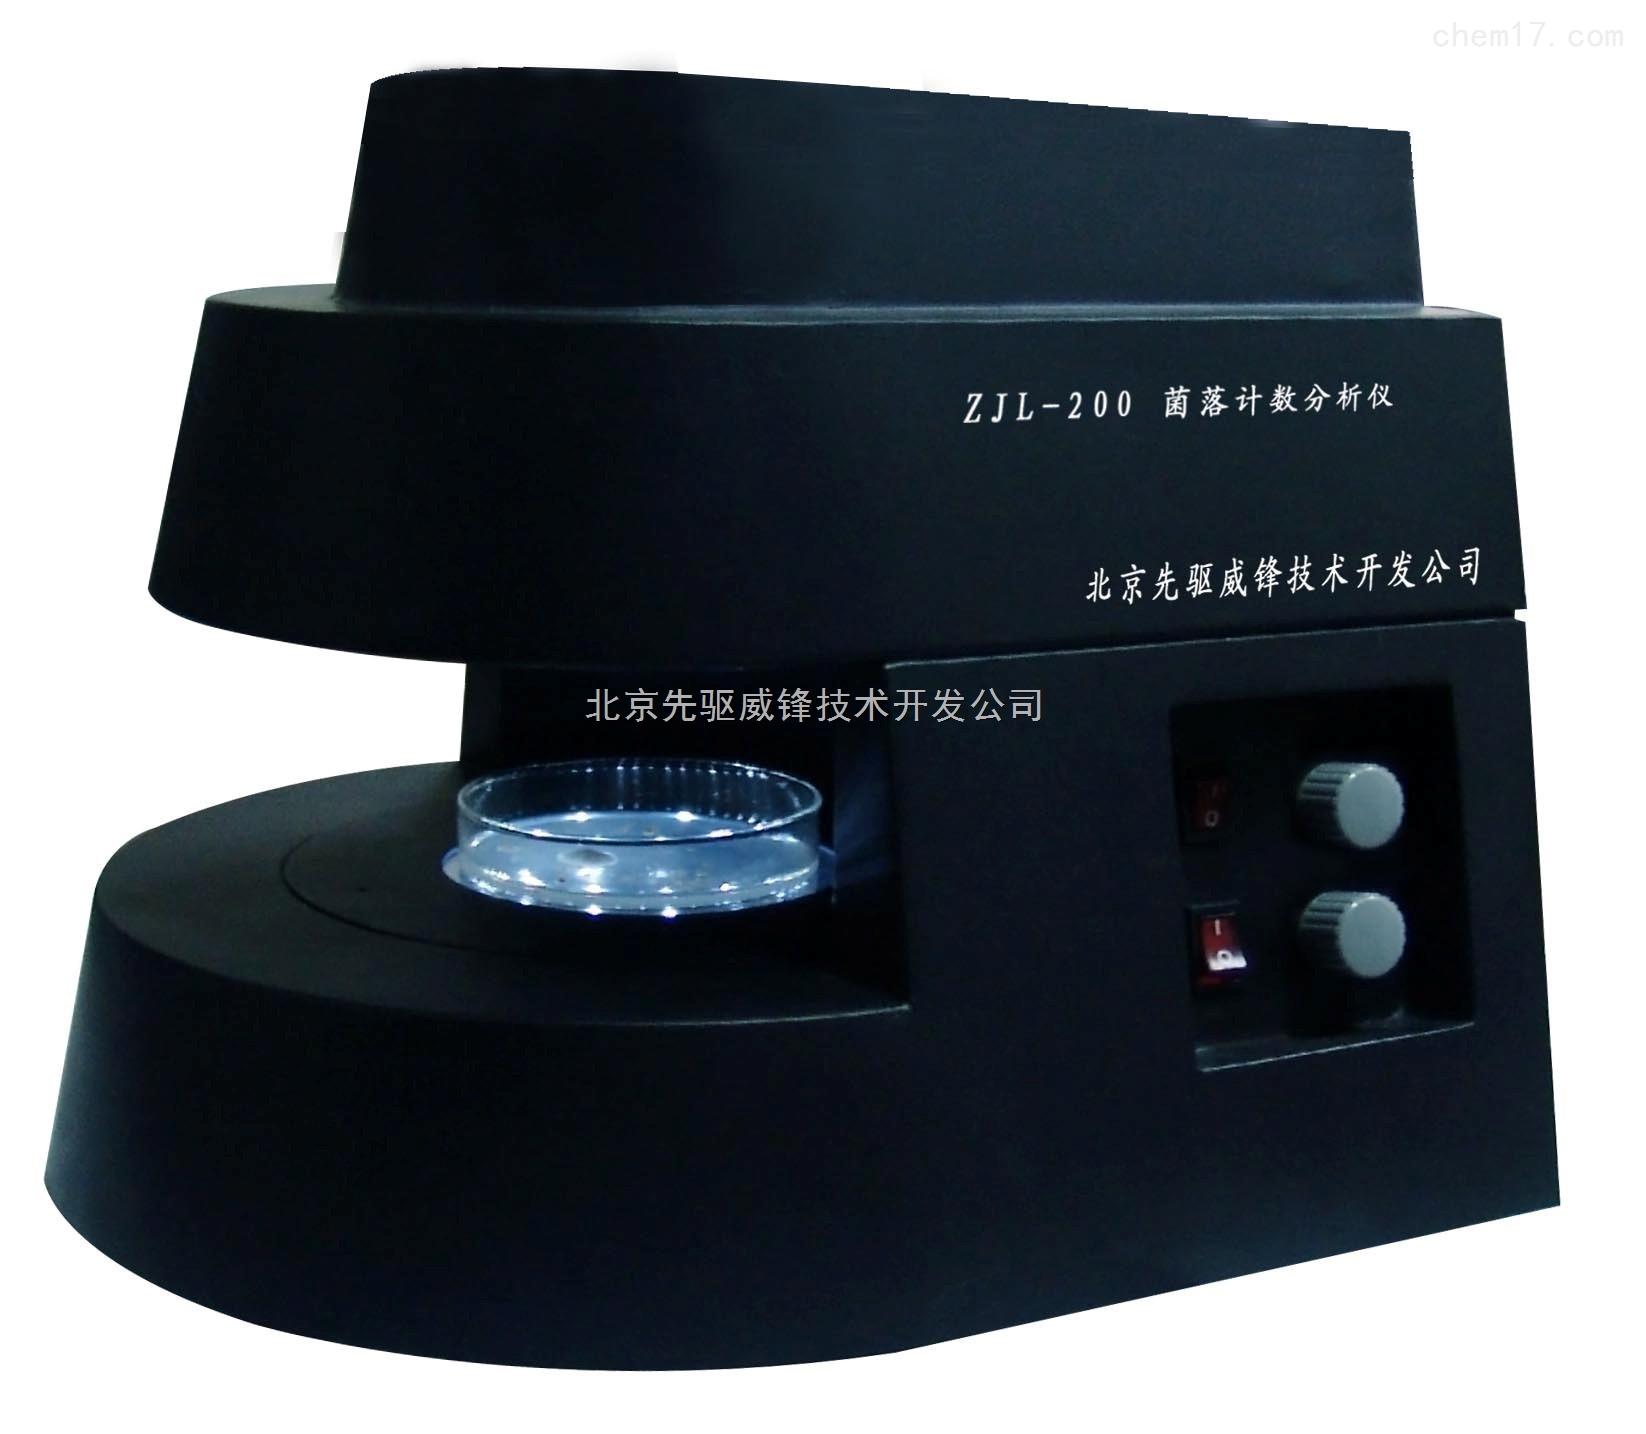 ZJL-200多功能全自動菌落計數